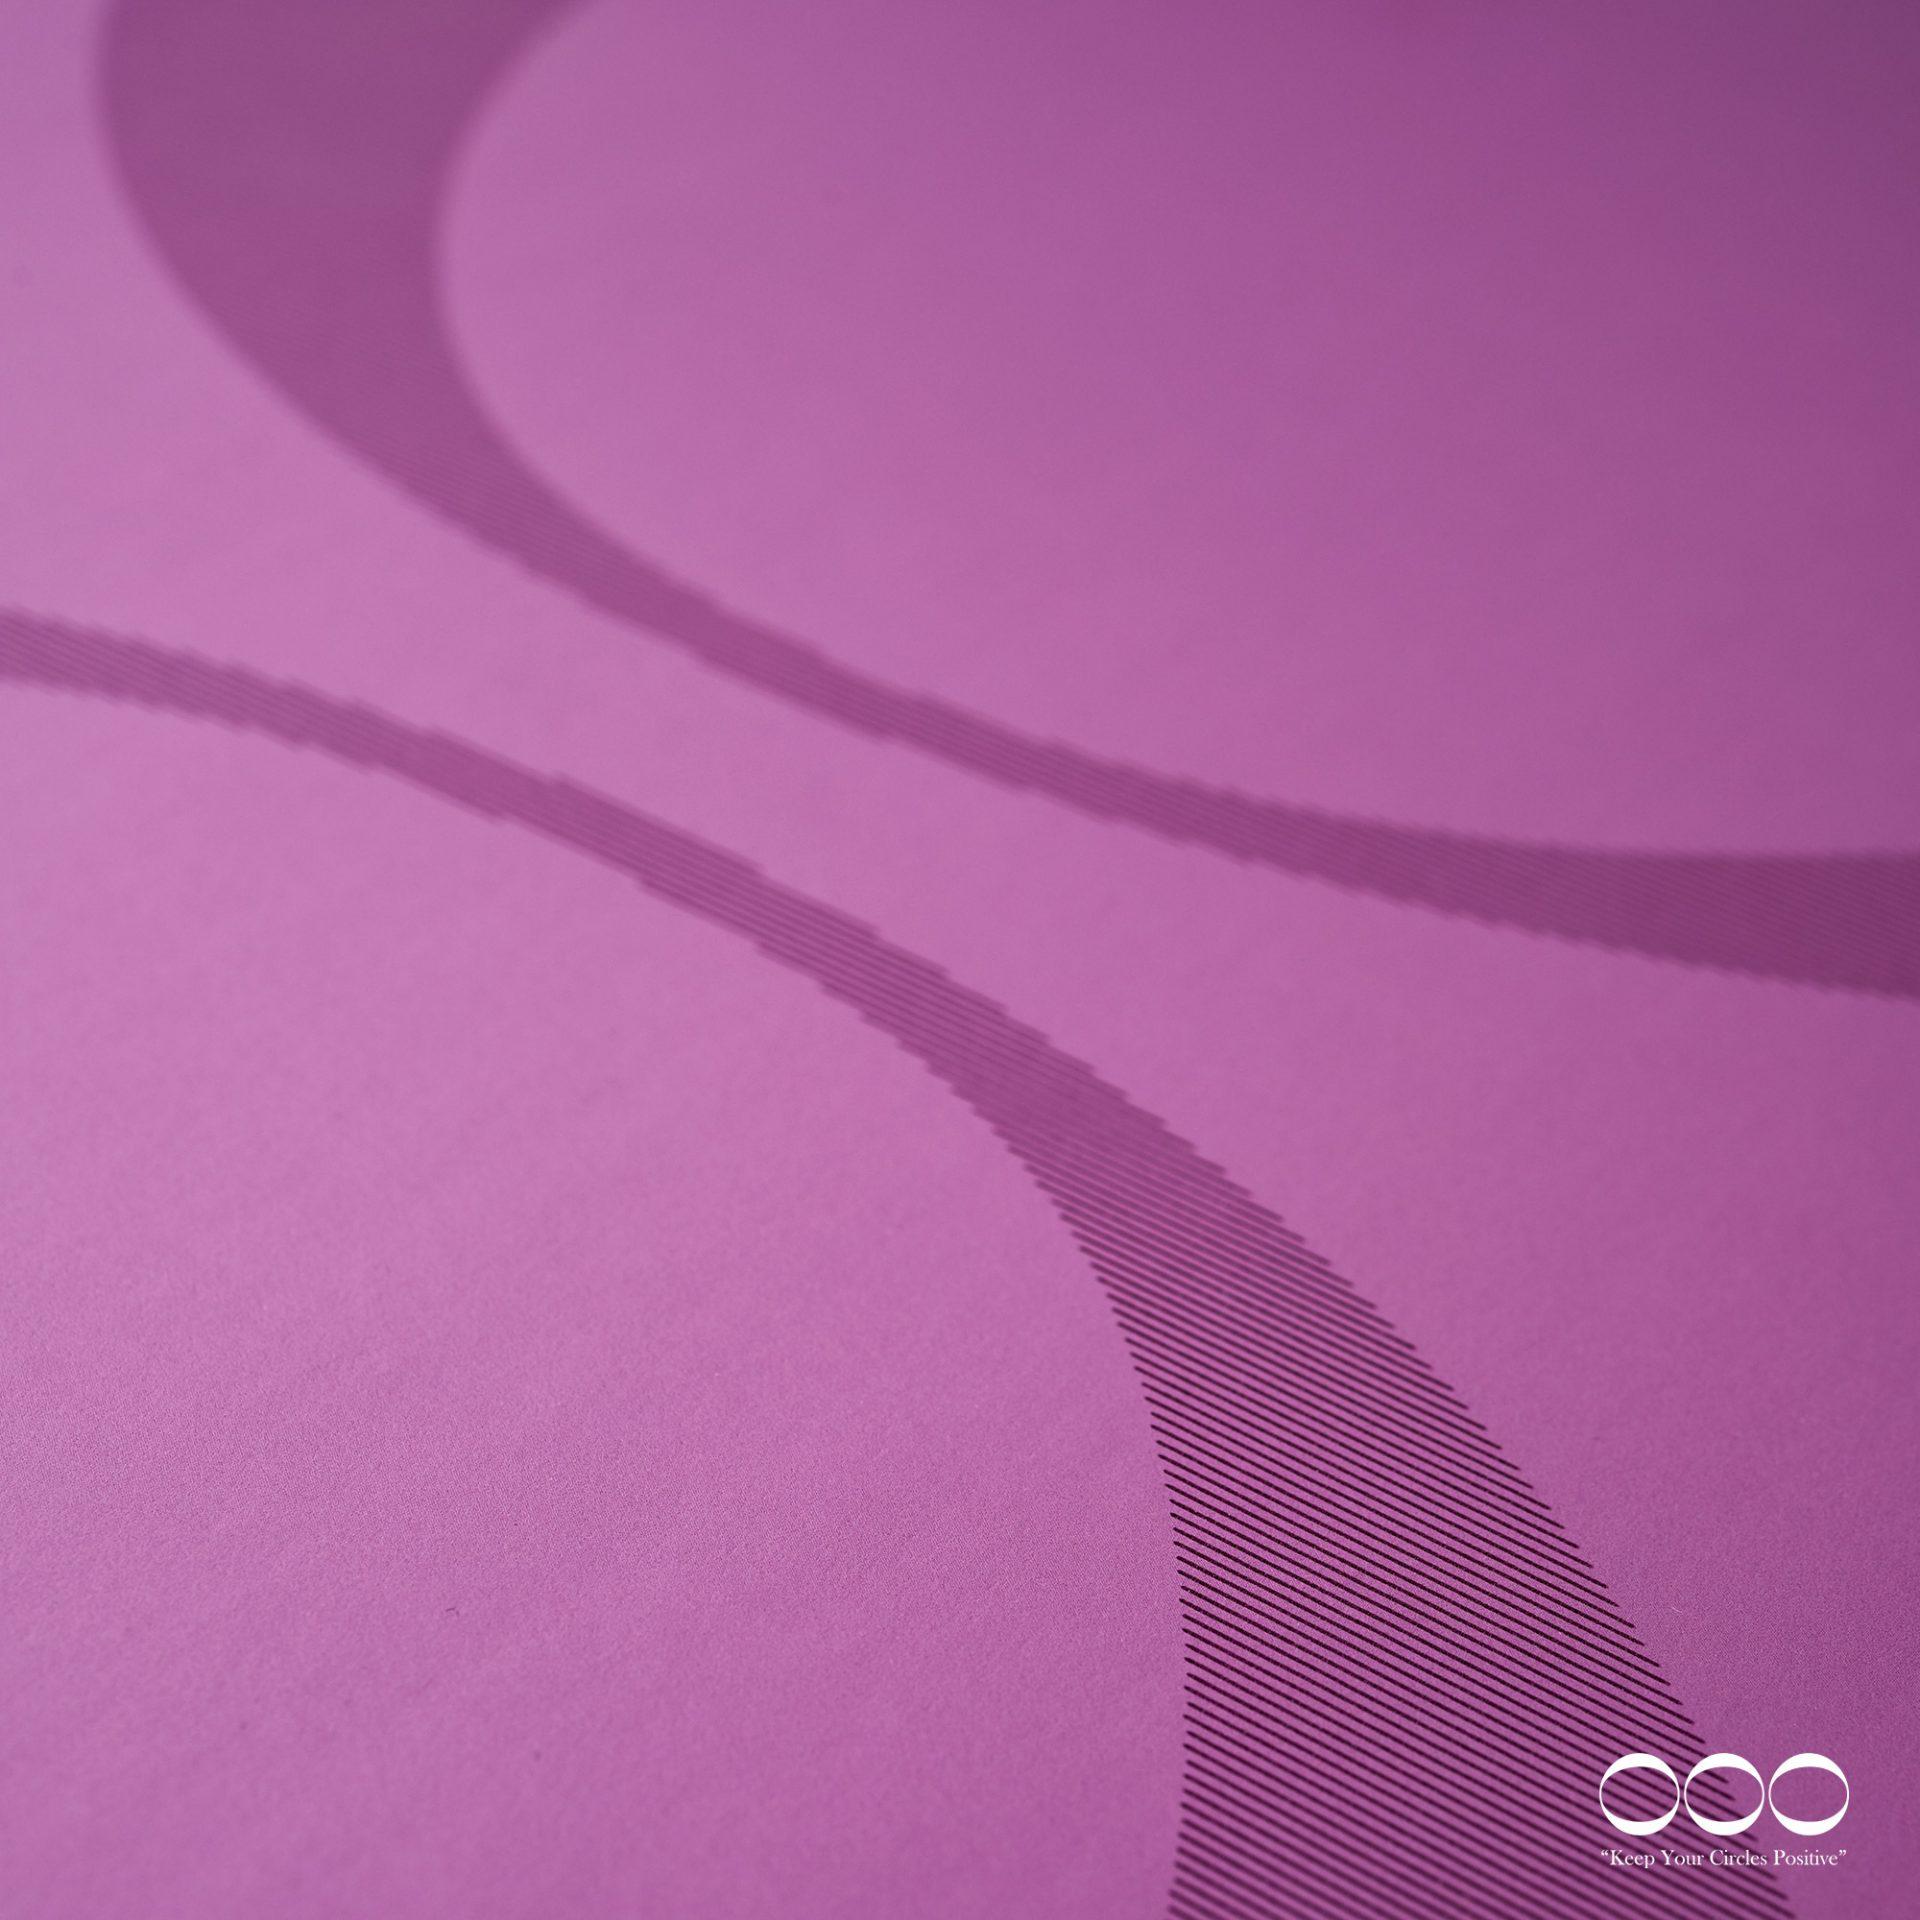 OOO-Dark-Purpler-close-shadow-pic1-1